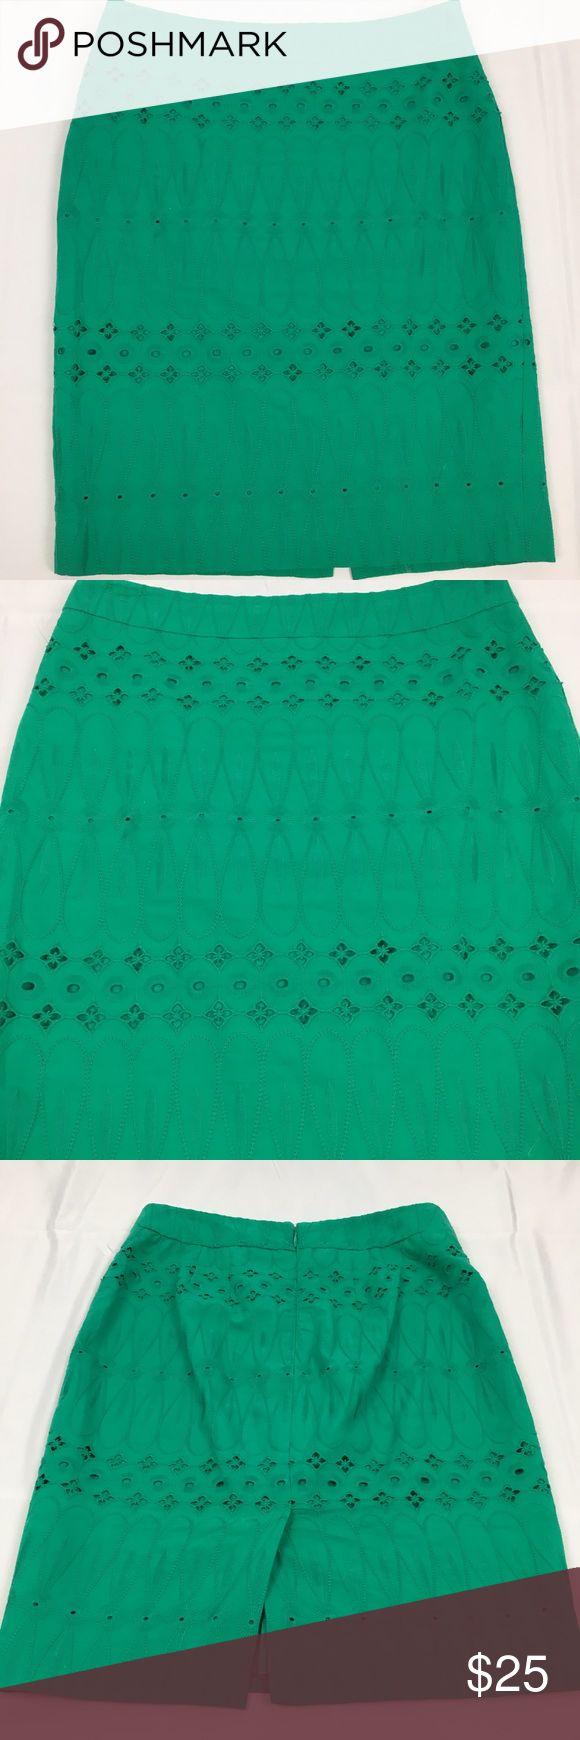 Loft Petite Green Crochet Detail Pencil Skirt Cute vibrant green Loft pencil skirt. Zip up back. Size 0 Petite. 27 inch waist. 19 inch length. Great condition. LOFT Skirts Pencil